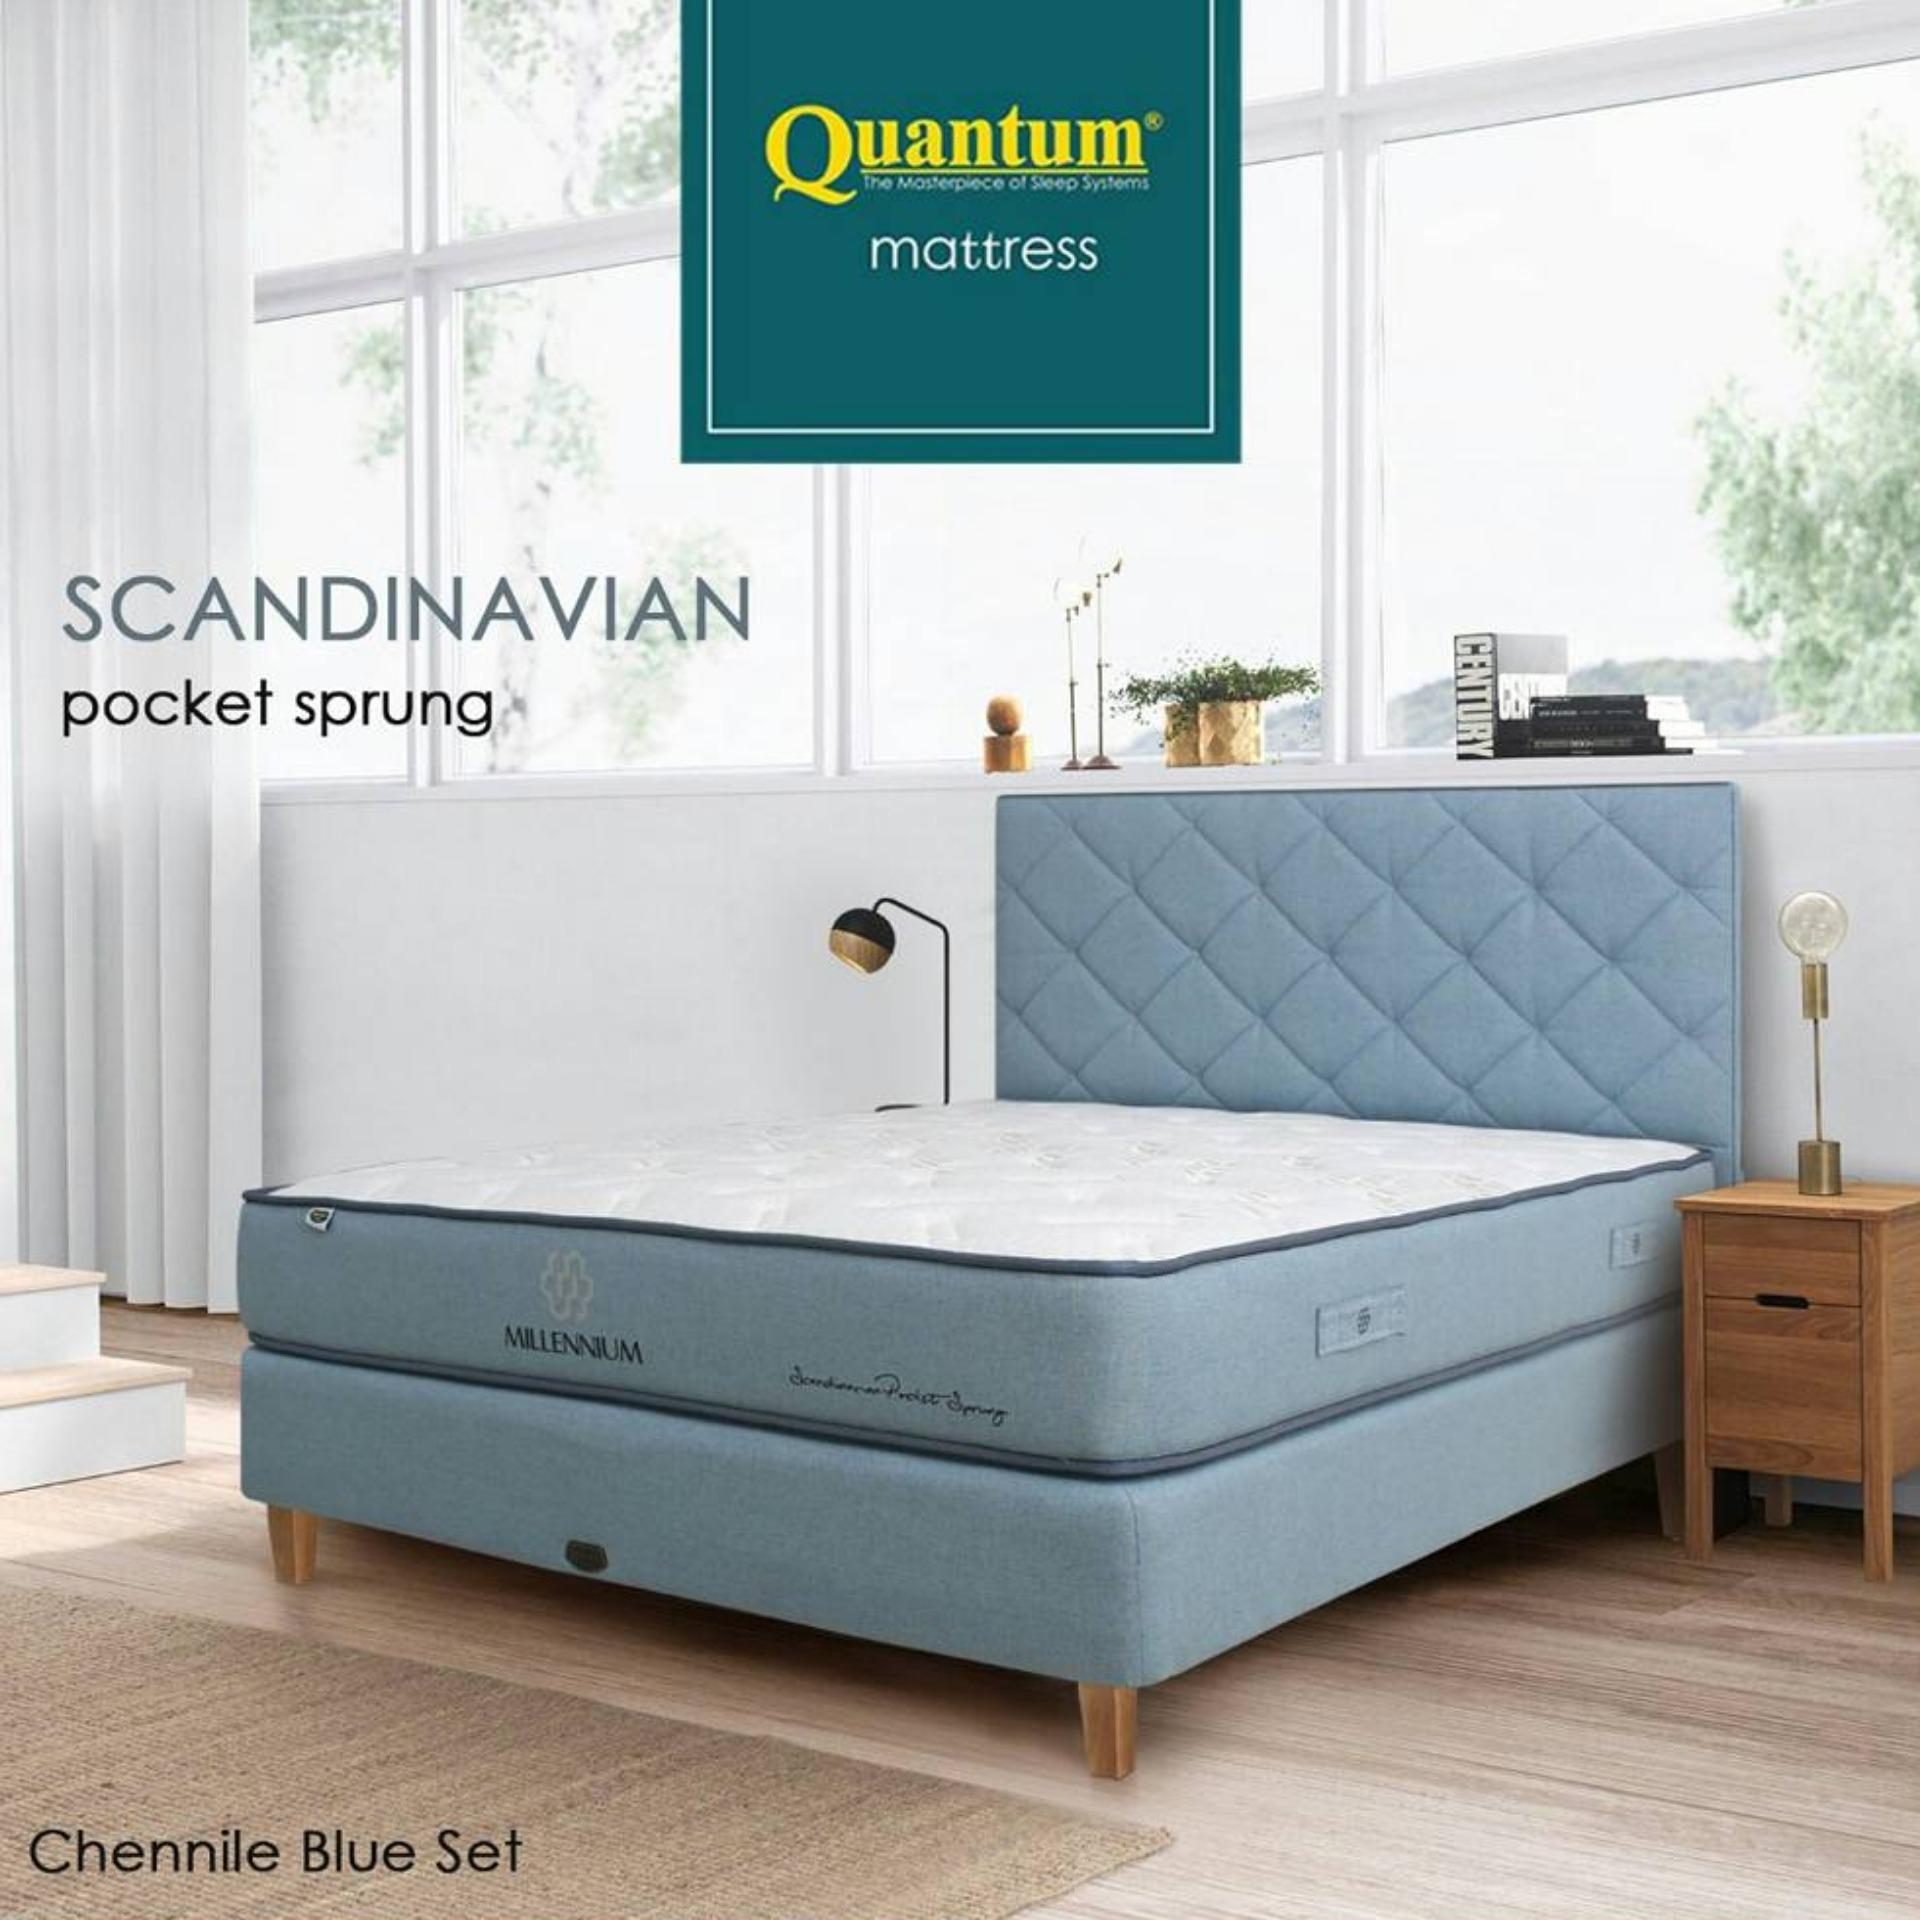 Quantum Springbed Millennium Scandinavian (Pocket Spring) HB Scandia Size 160 x 200 - Chennile Blue - Full Set - Putih - Khusus Jabodetabek